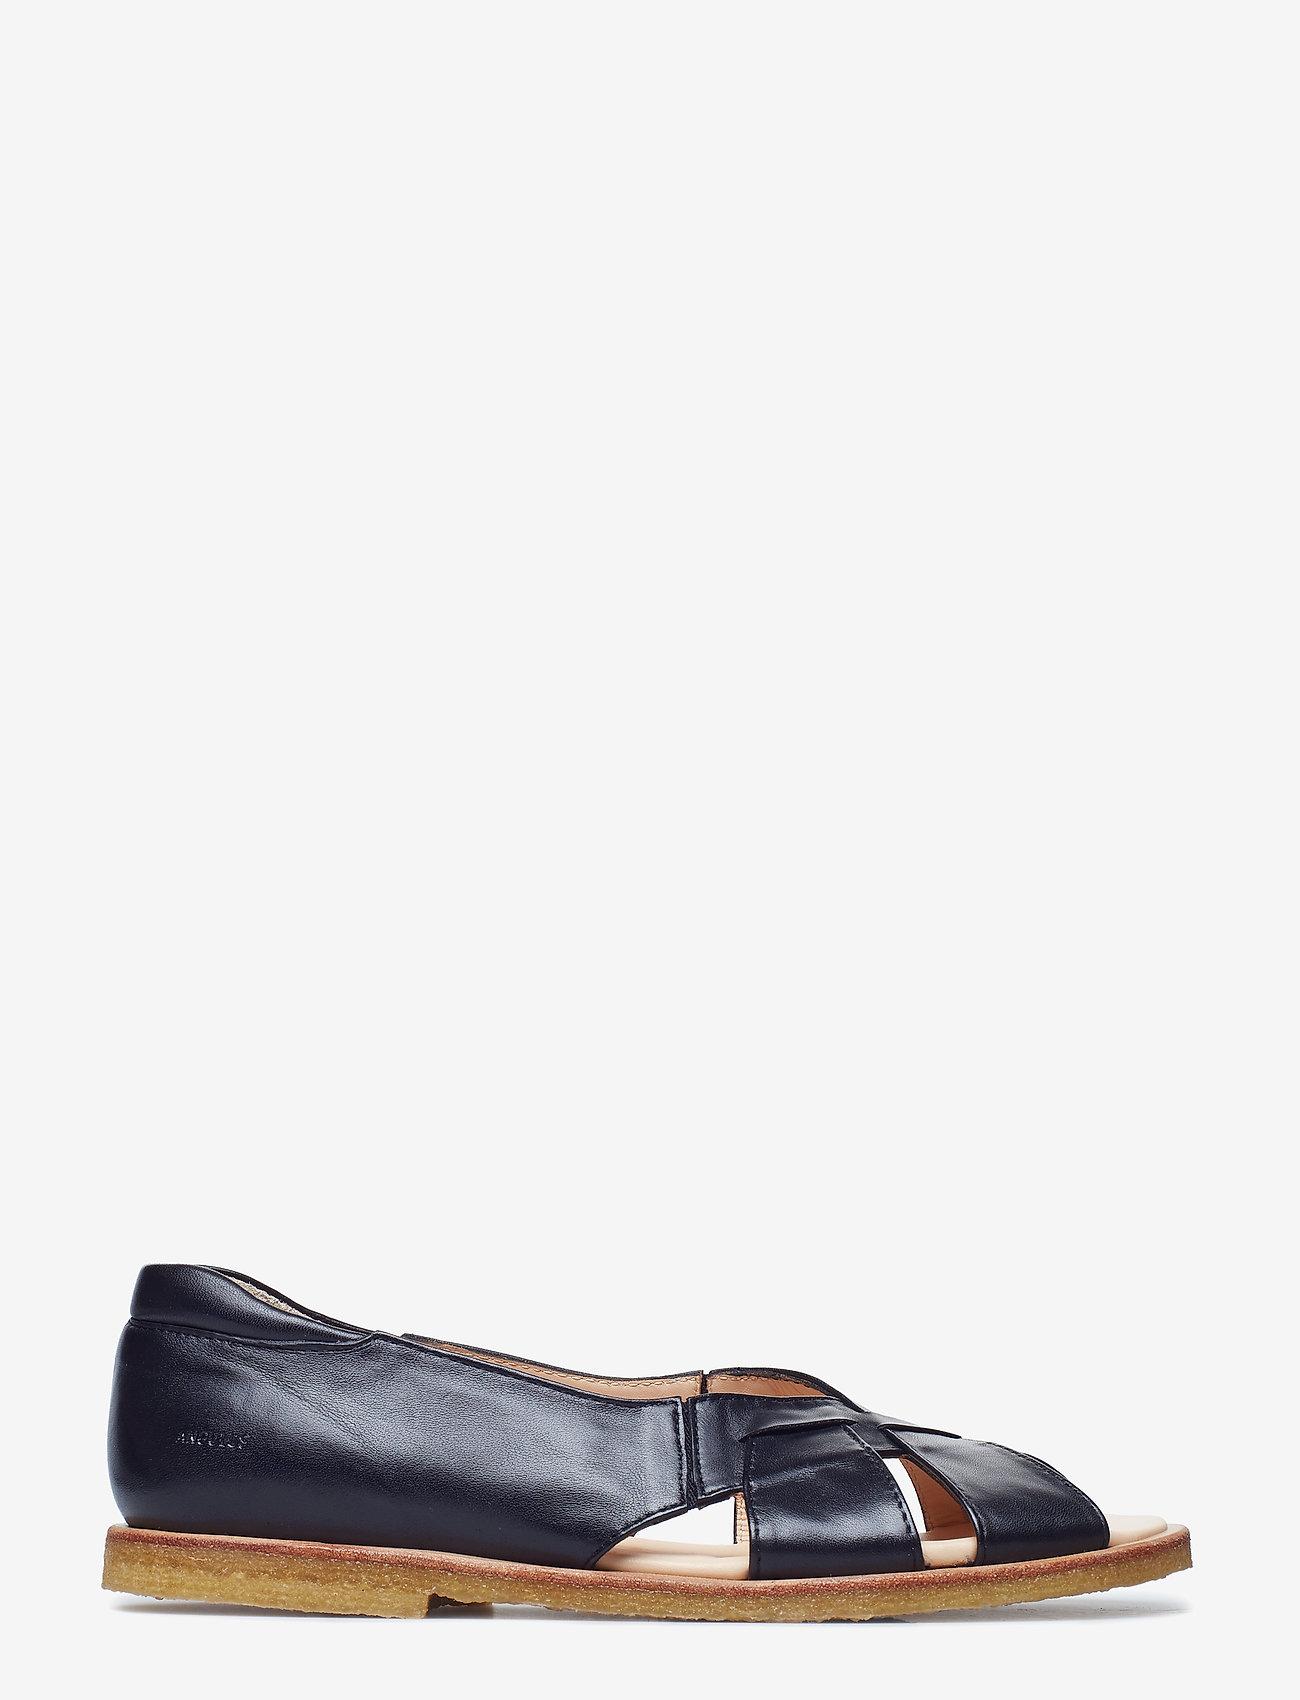 ANGULUS - Sandals - flat - open toe - op - platta sandaler - 1604/001 black/black - 1